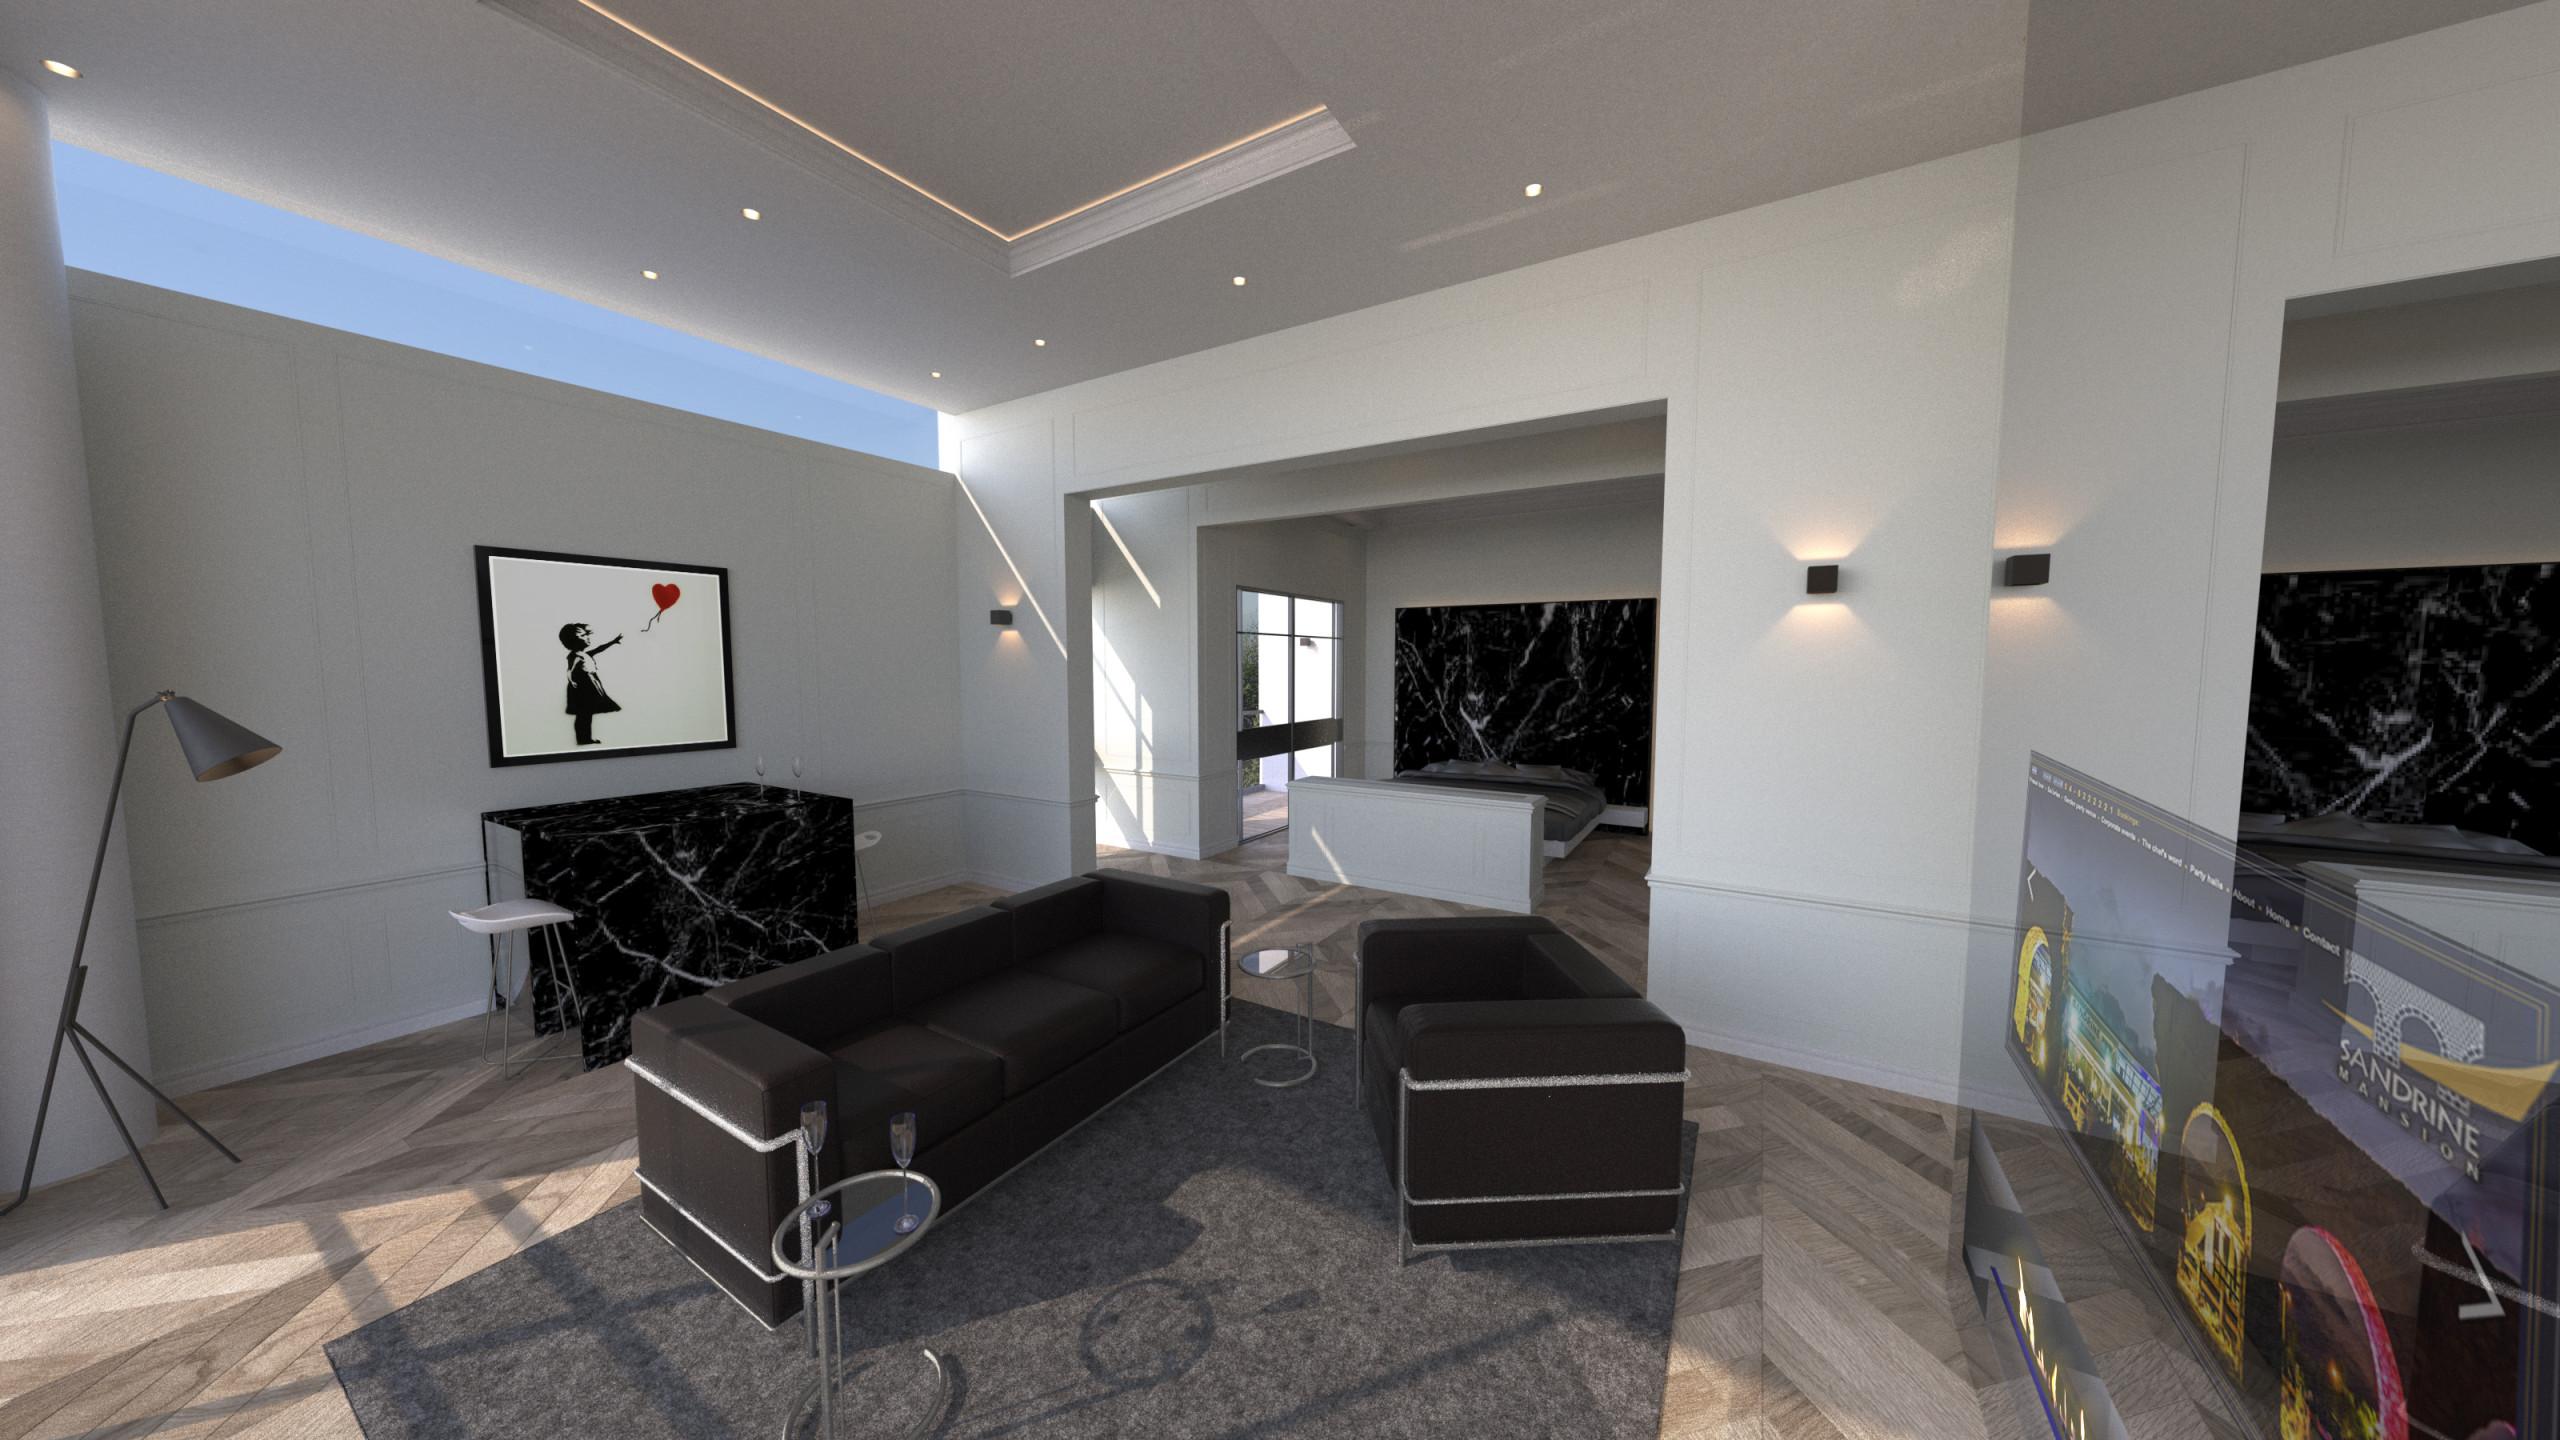 Hôtel Sandrine Mansion - Paris